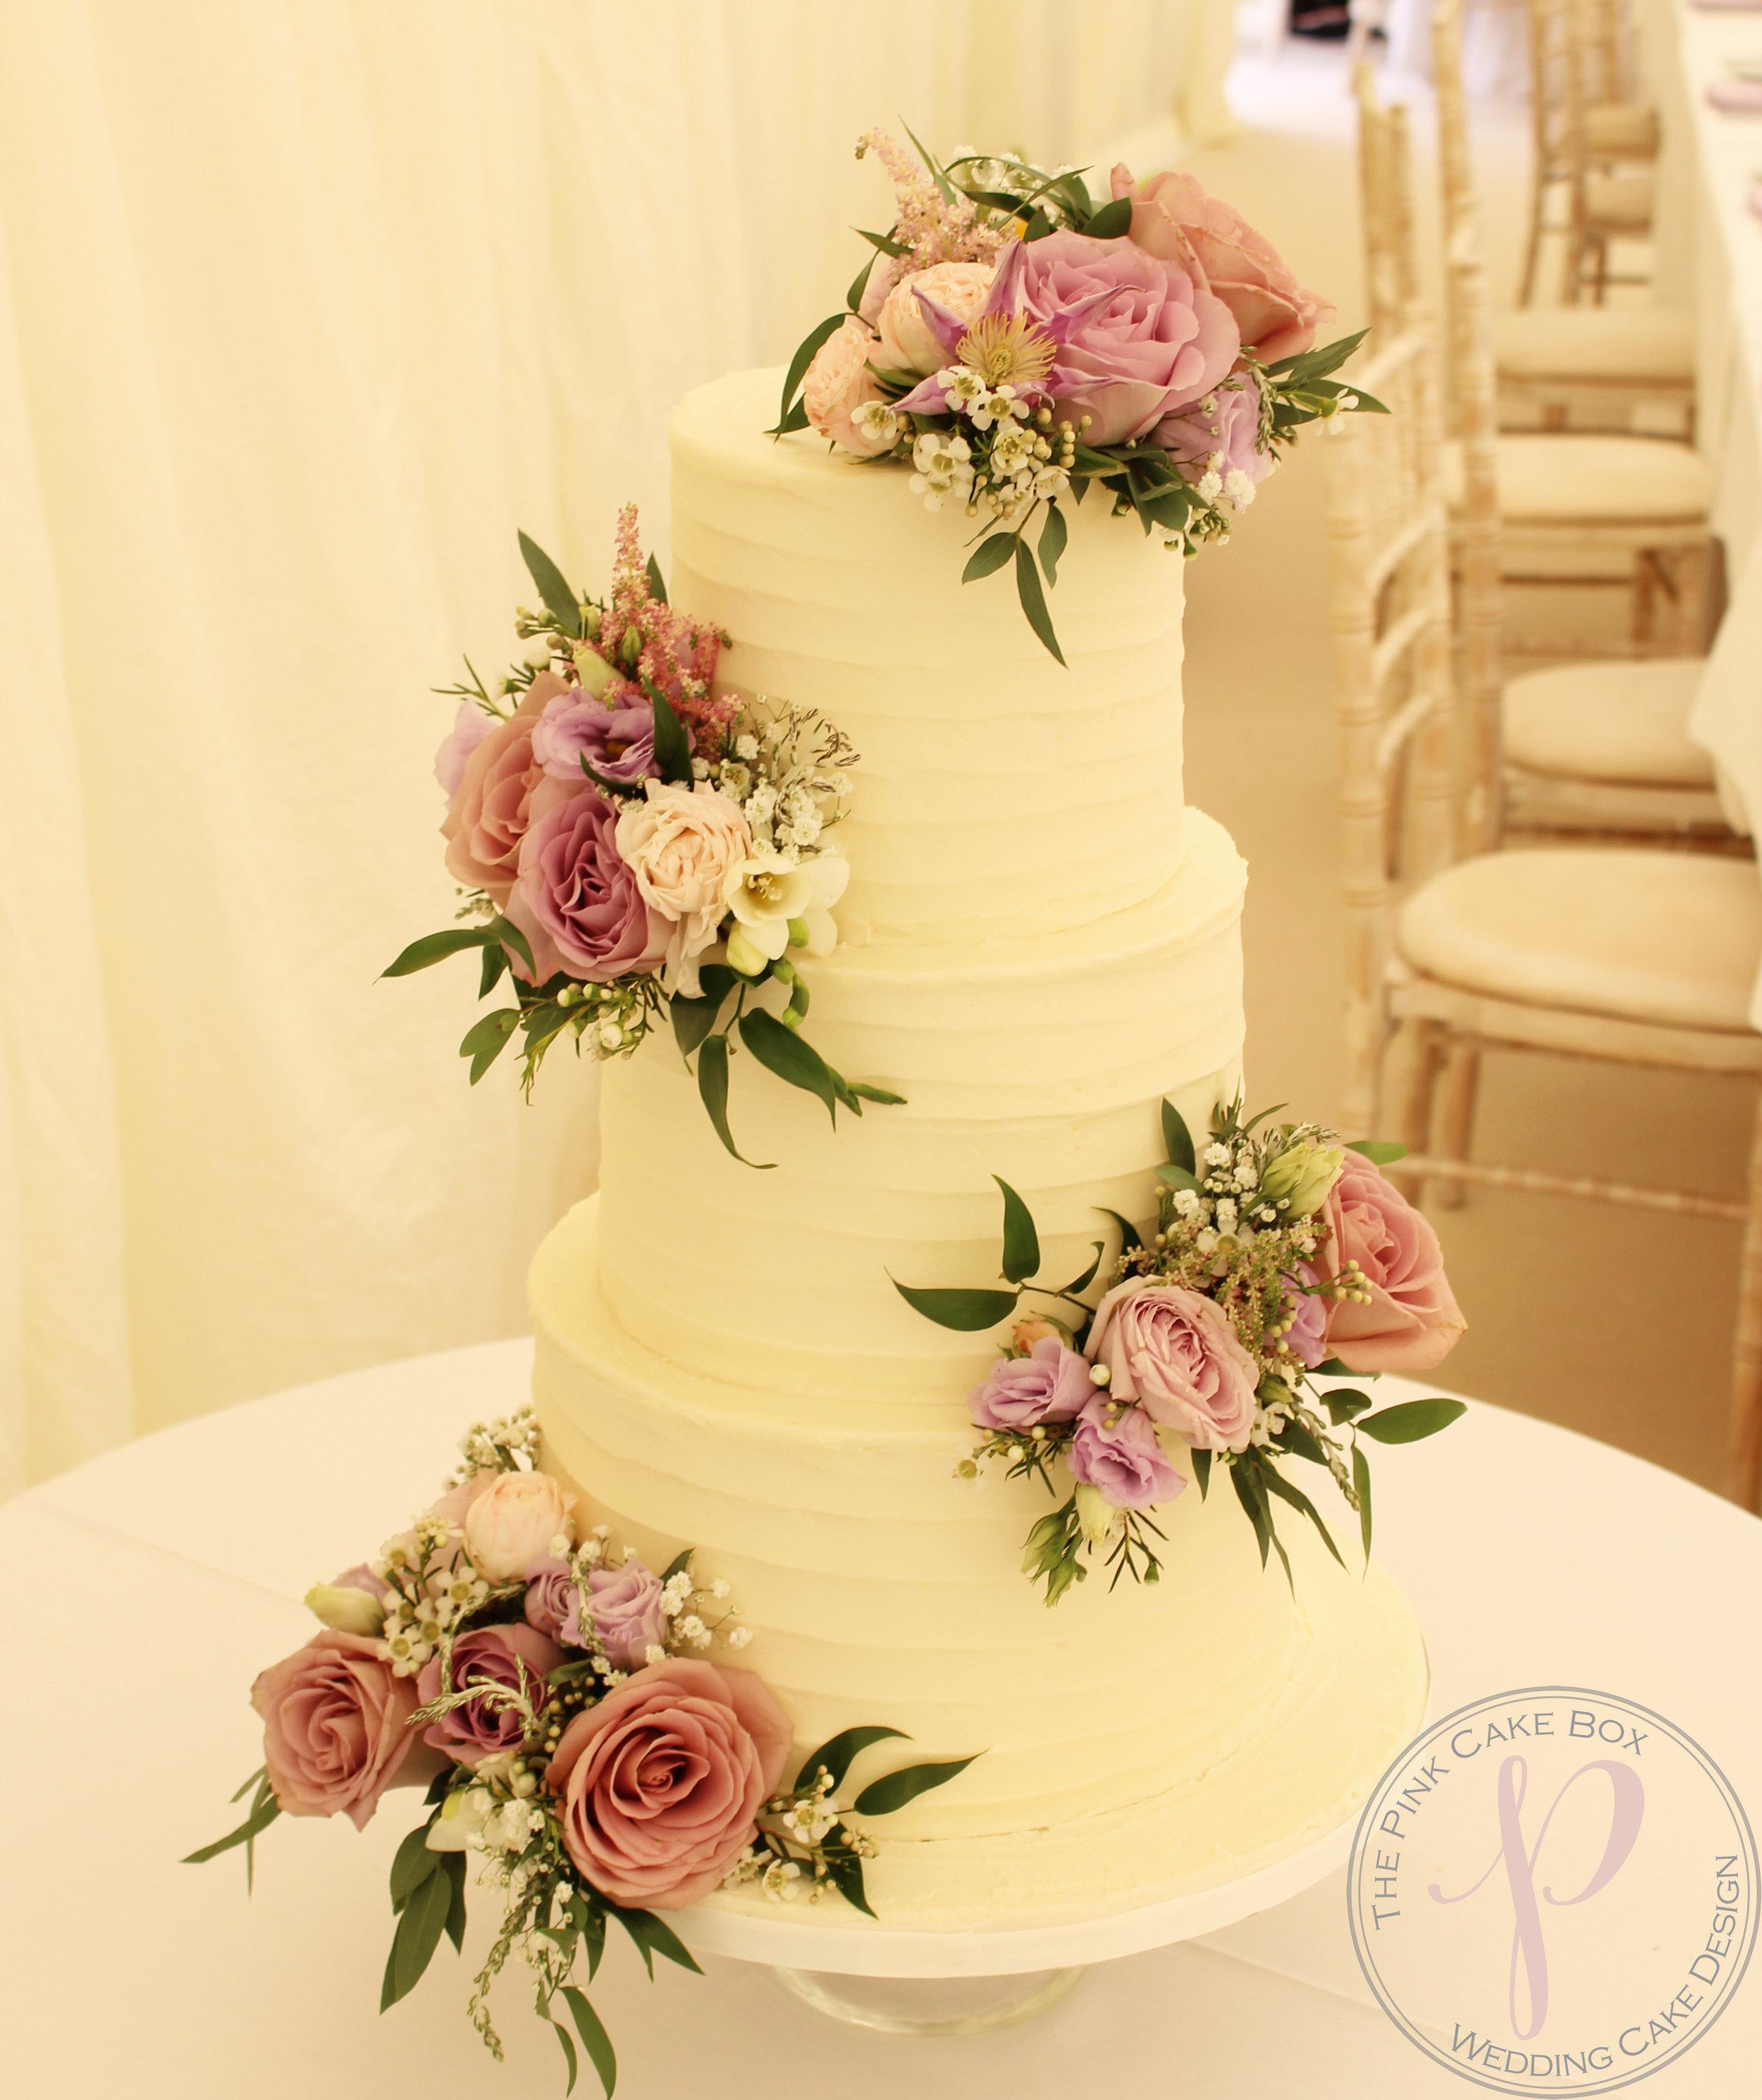 buttercream wedding cake lilac pink roses.jpg